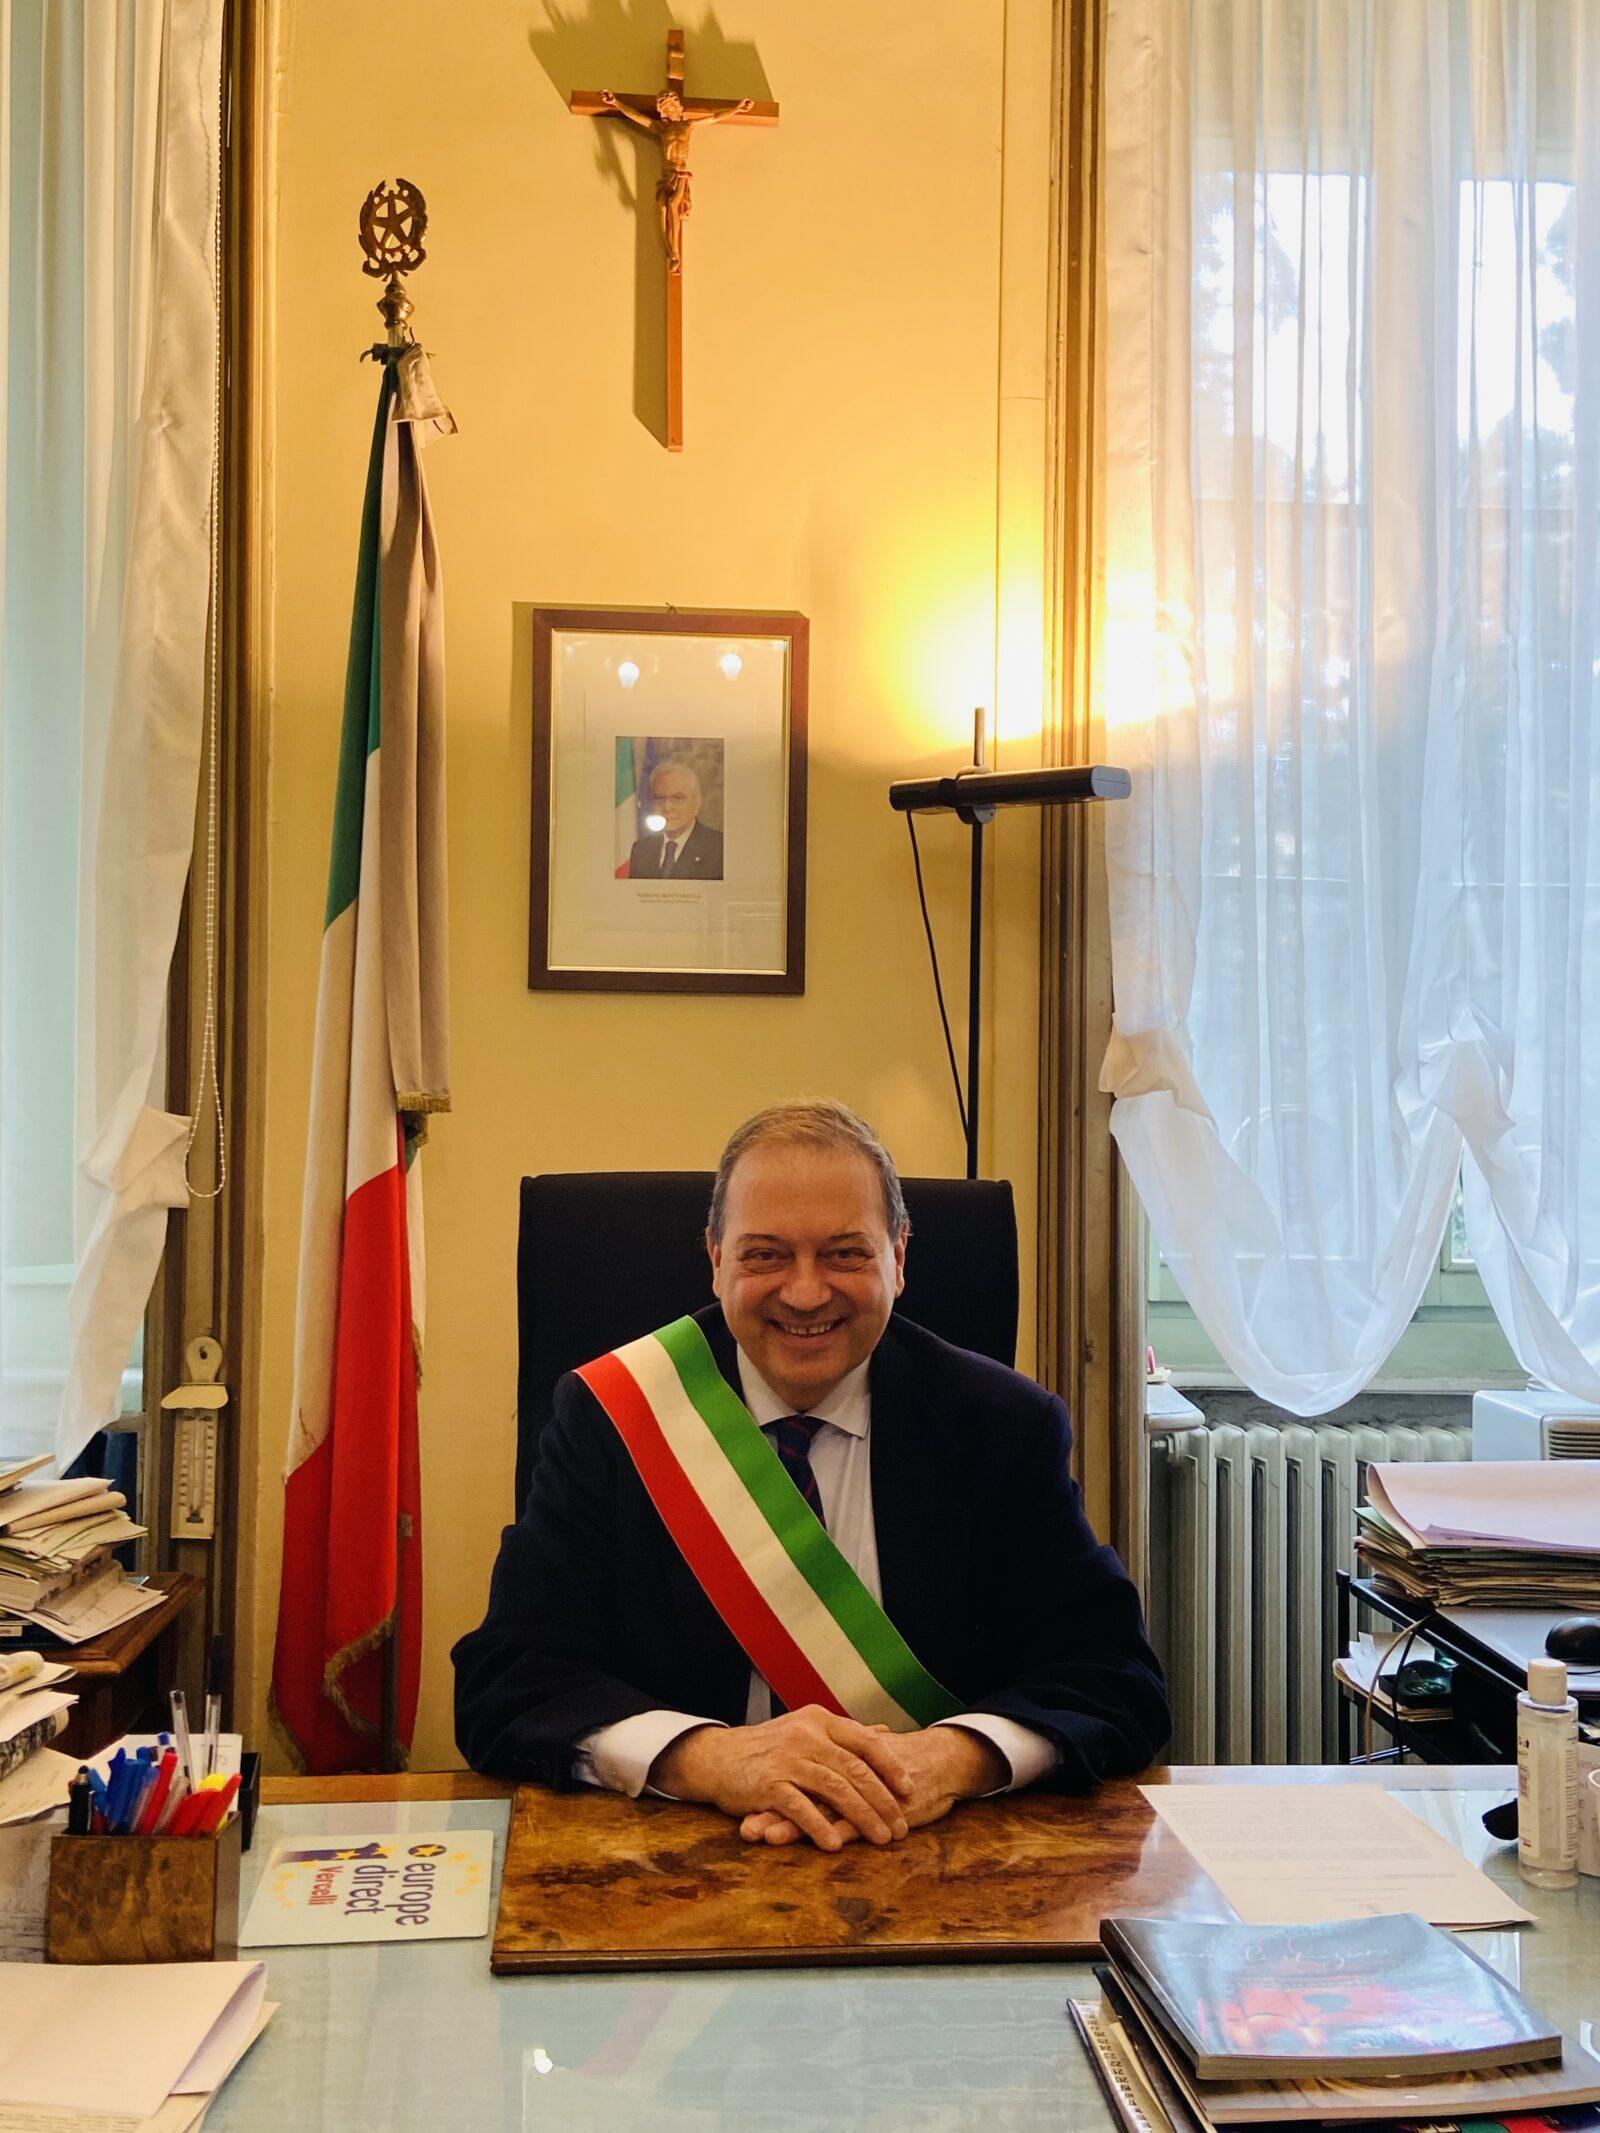 Vercelli mayor Andrea Corsaro